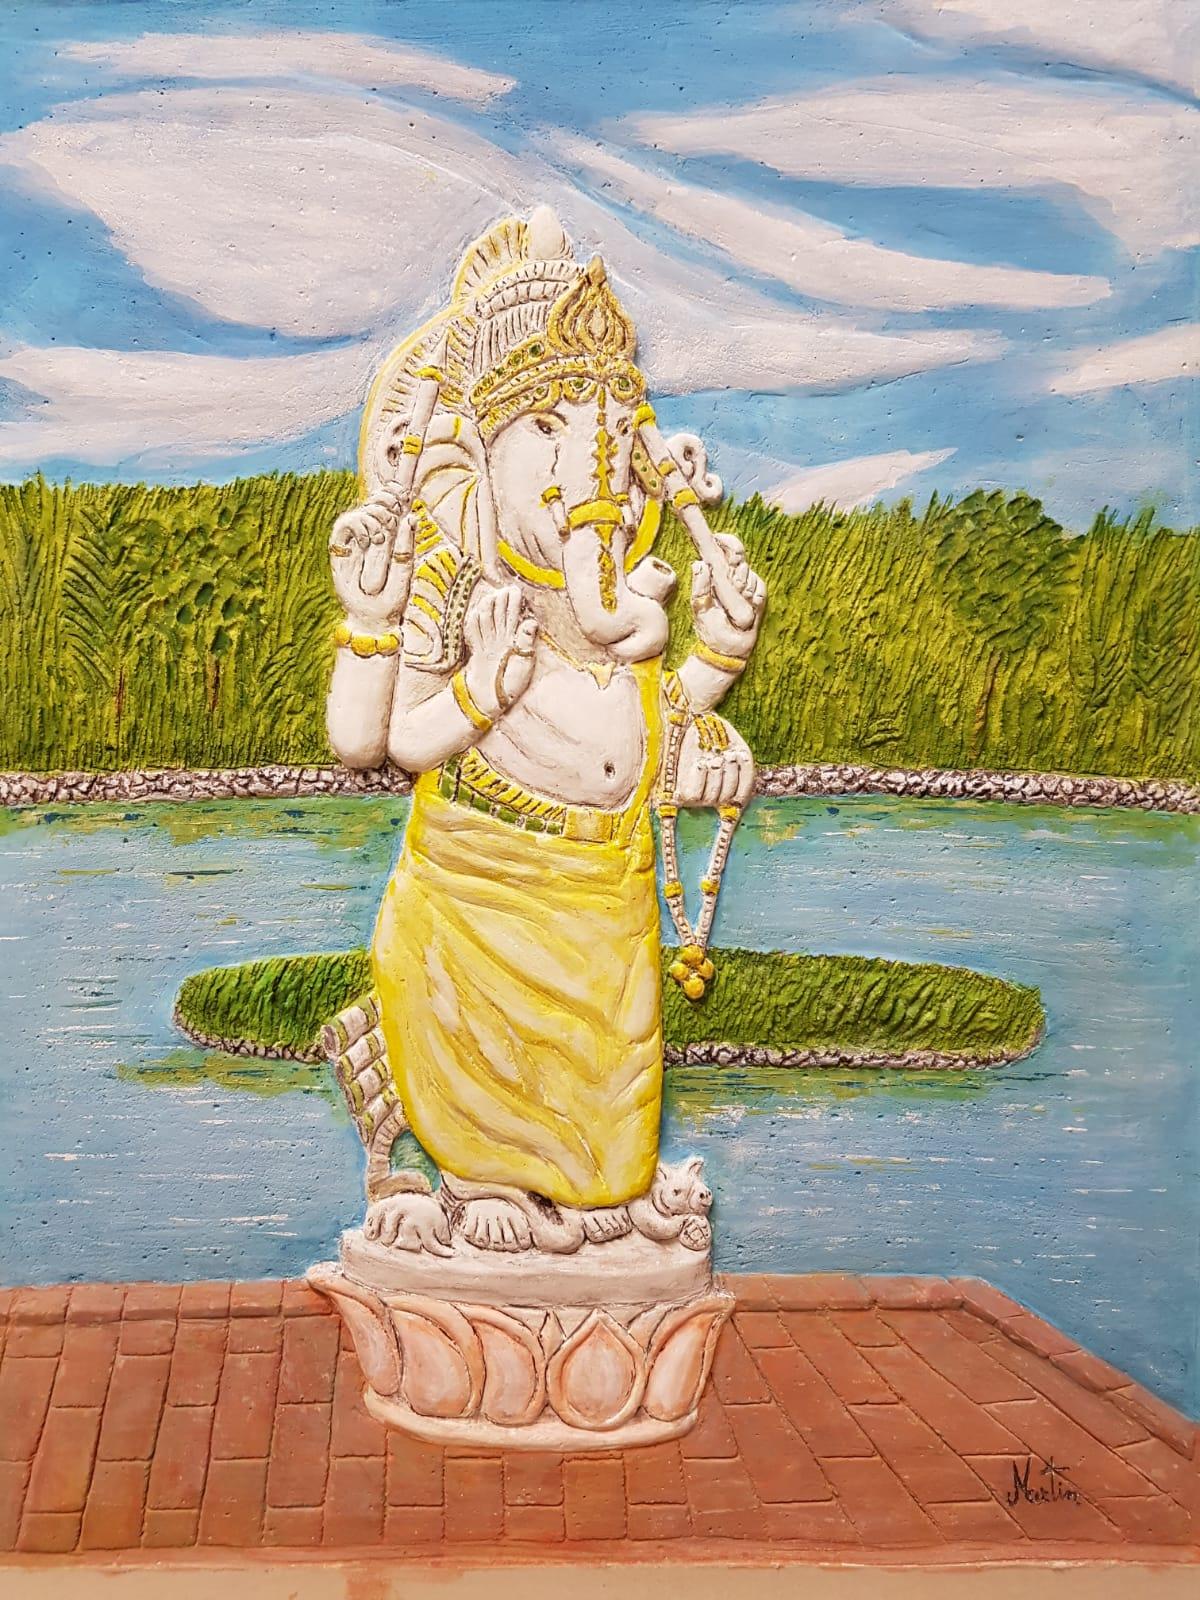 Martin Raffaele – Ganesh, divinità del Ganga Talao